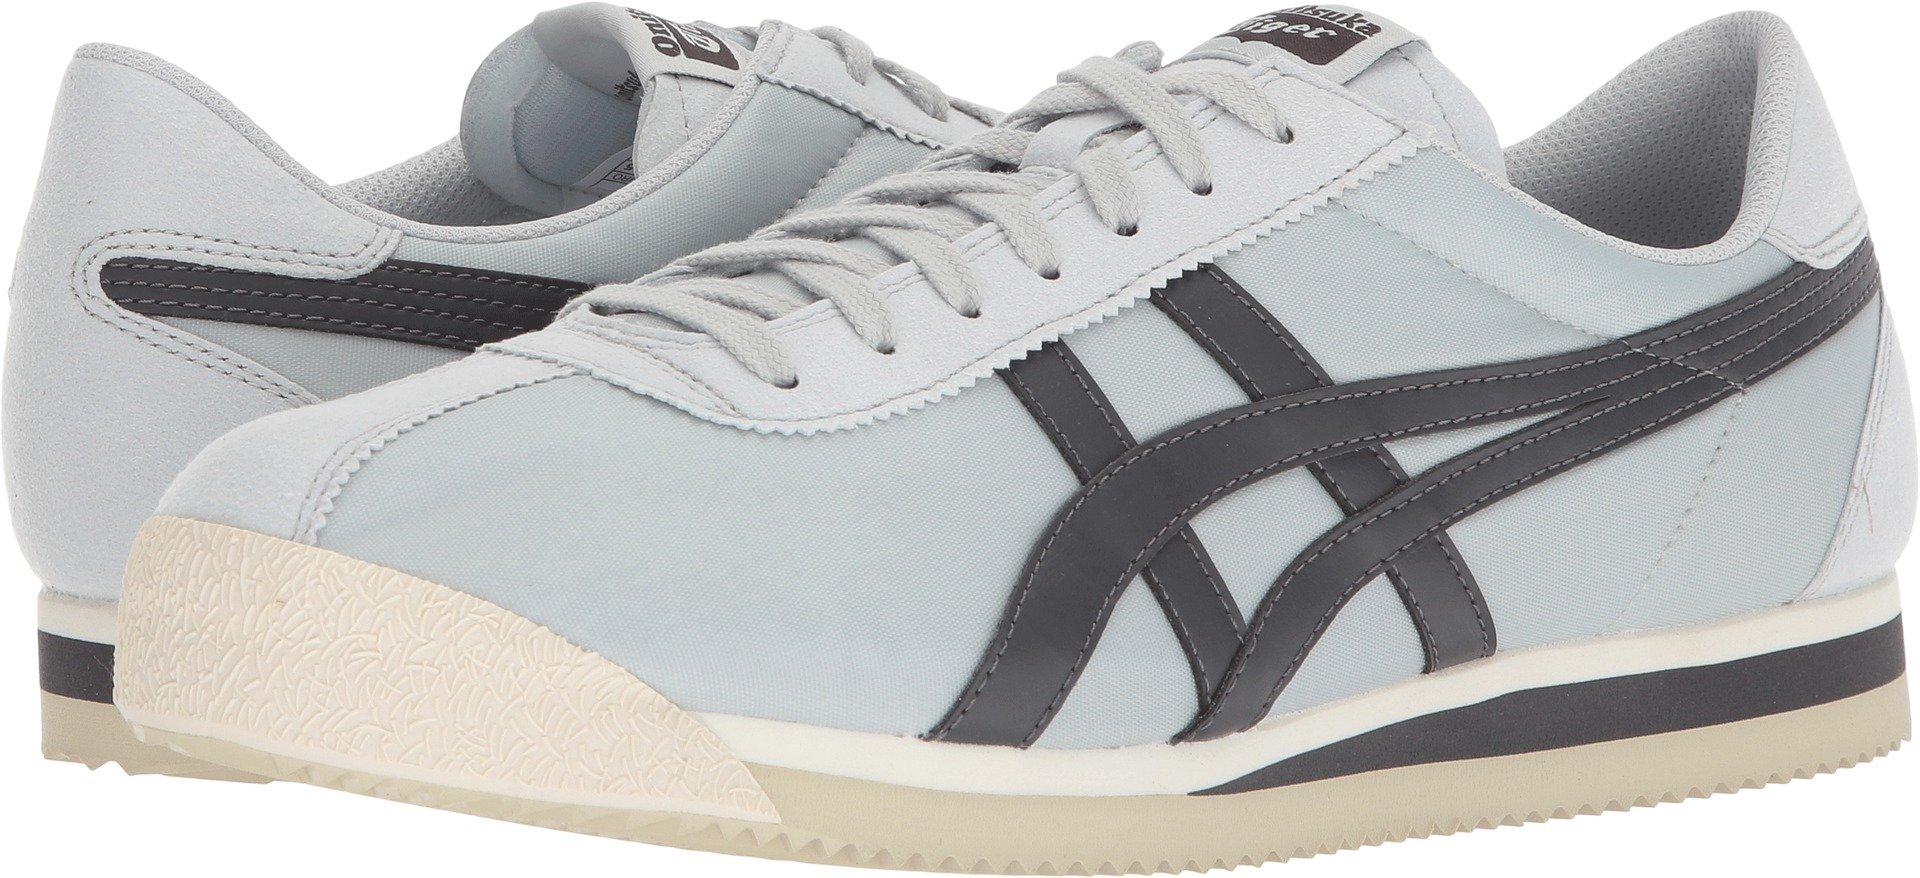 48c4fef7d3e23 Buy Onitsuka Tiger Tiger Corsair VIN Fashion Sneaker in Cheap Price ...